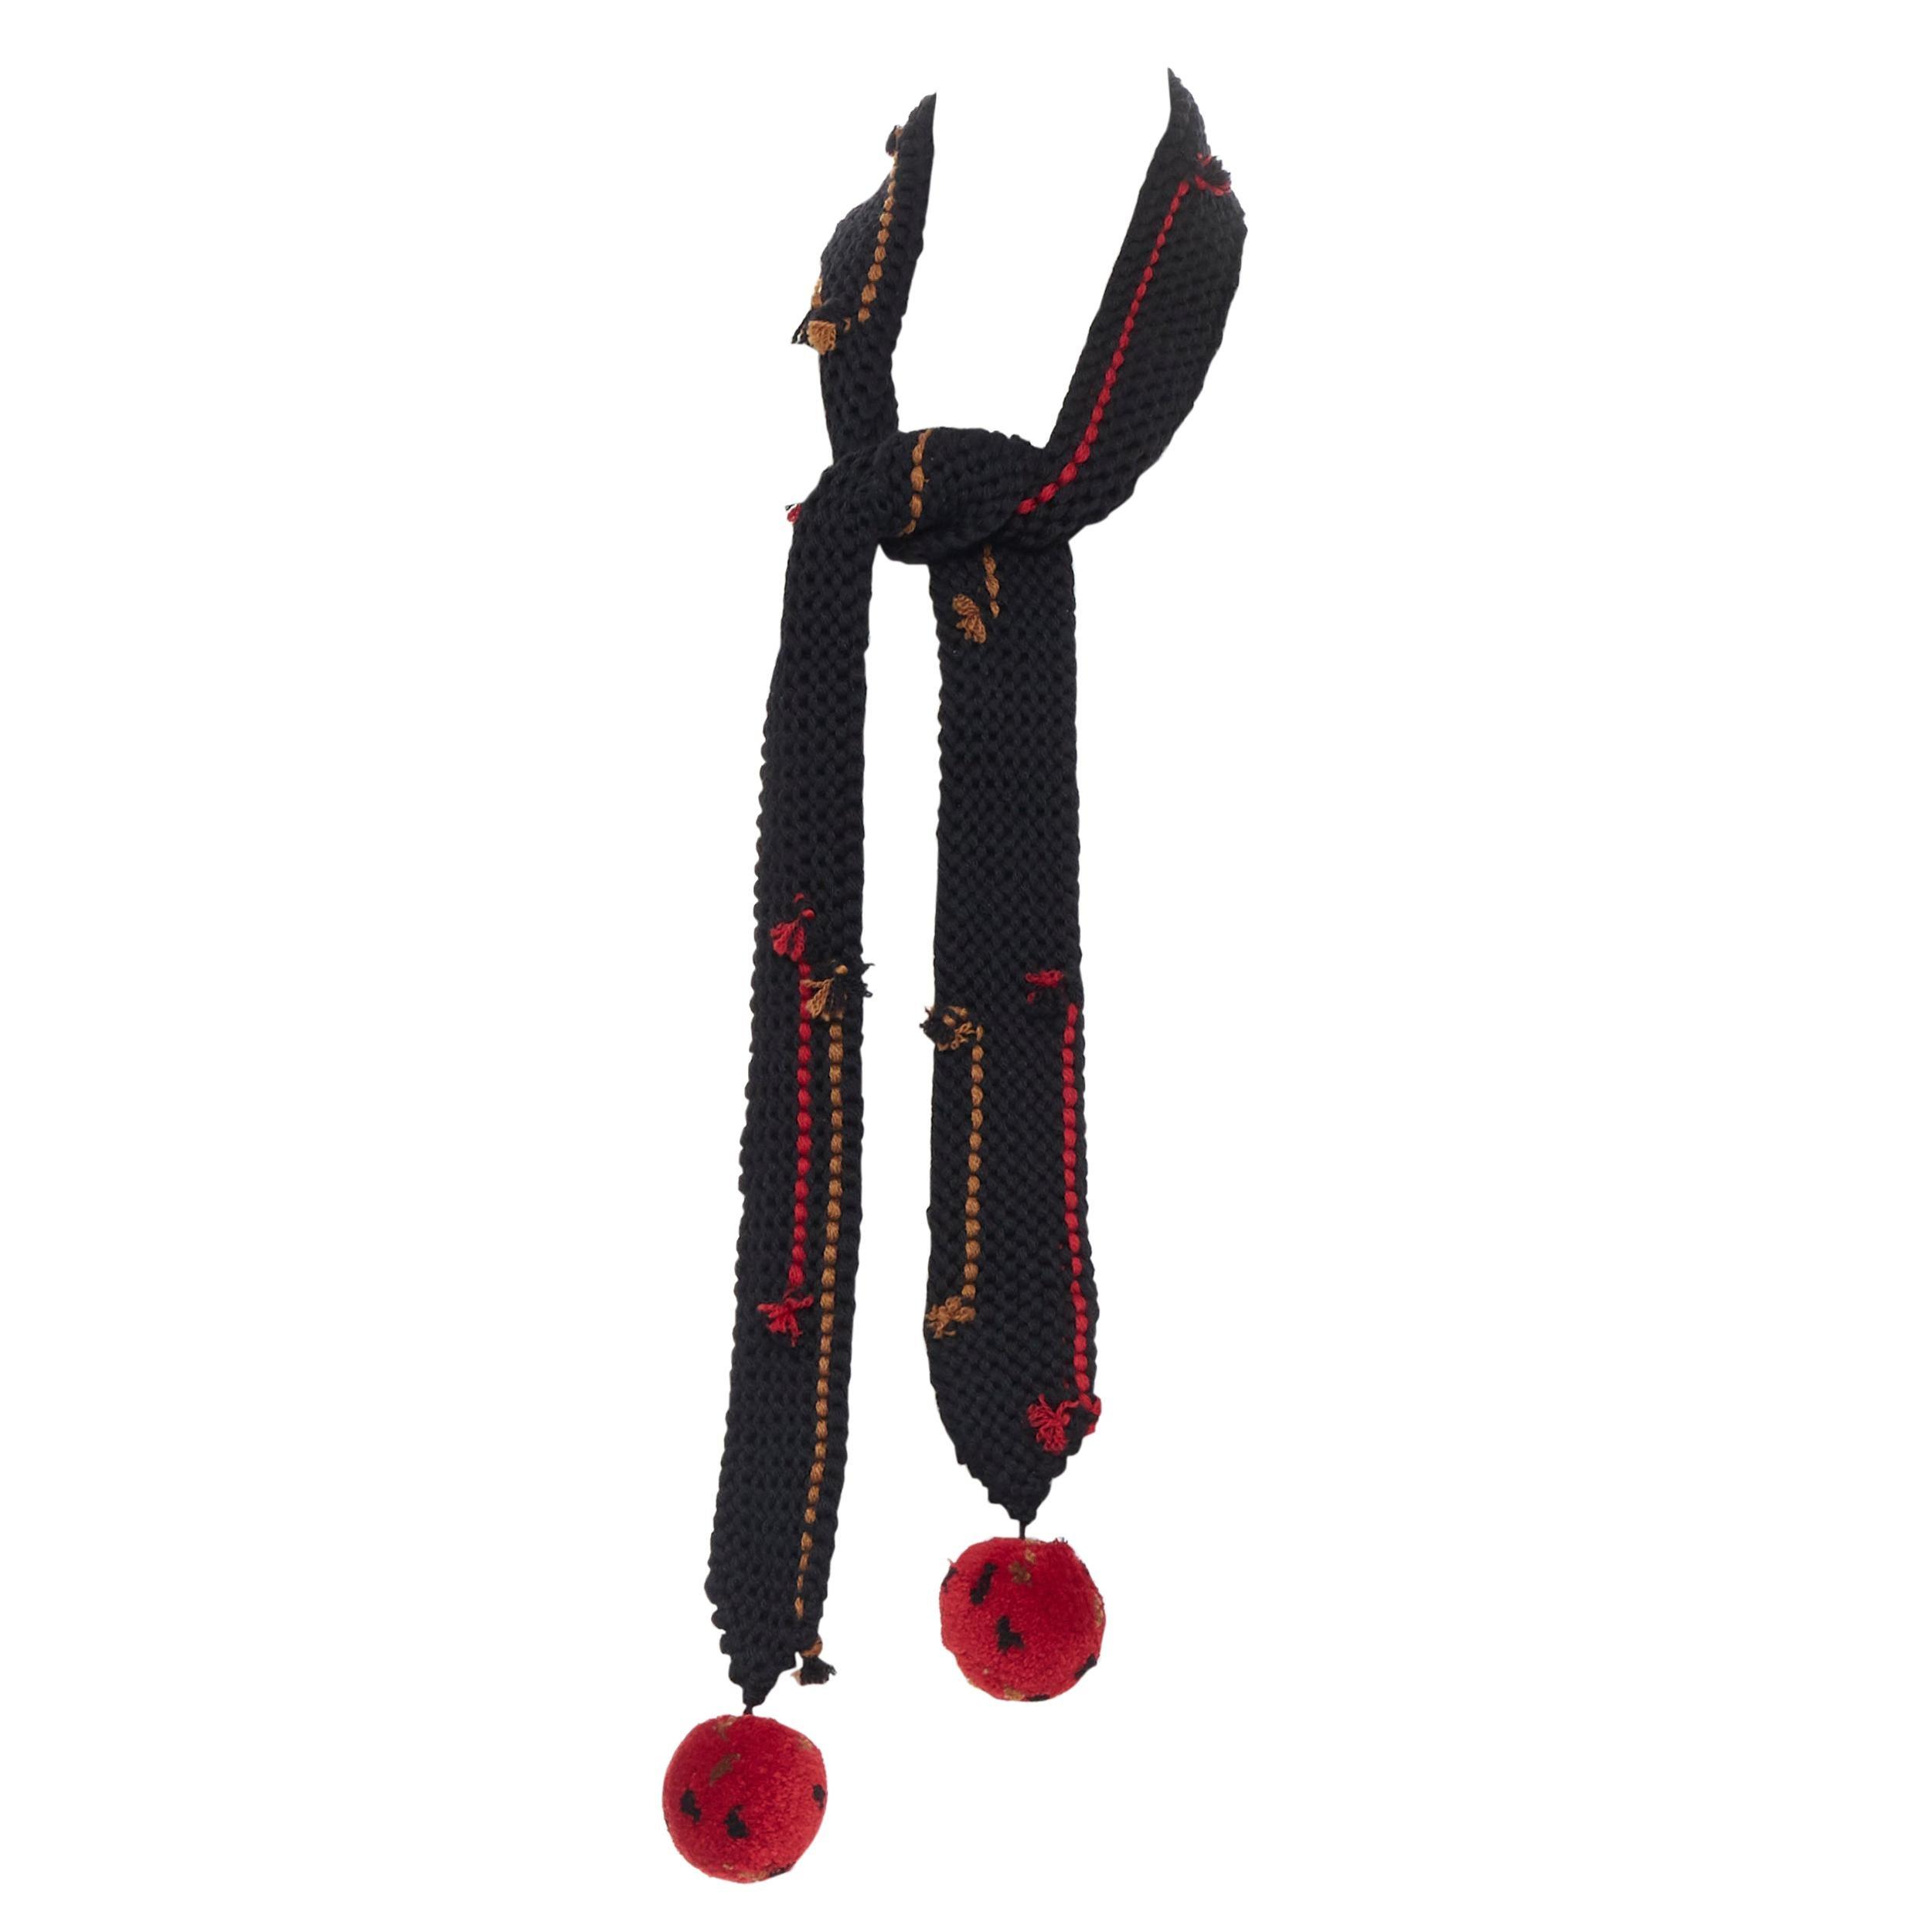 new PRADA 2017 Runway Hand Made black crochet knit red pom skinny long scarf